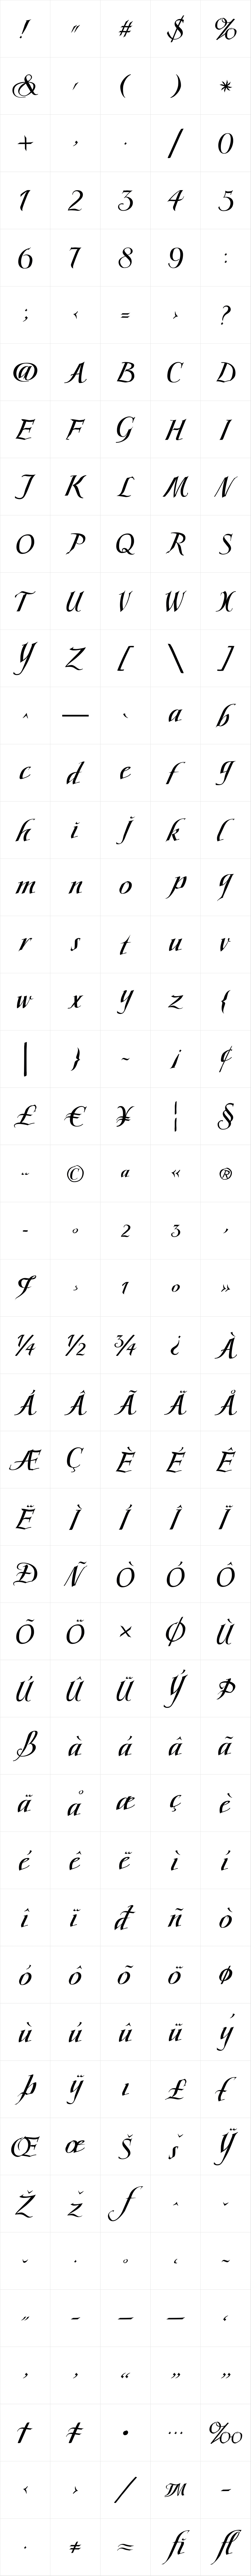 Scriptissimo Forte Middle